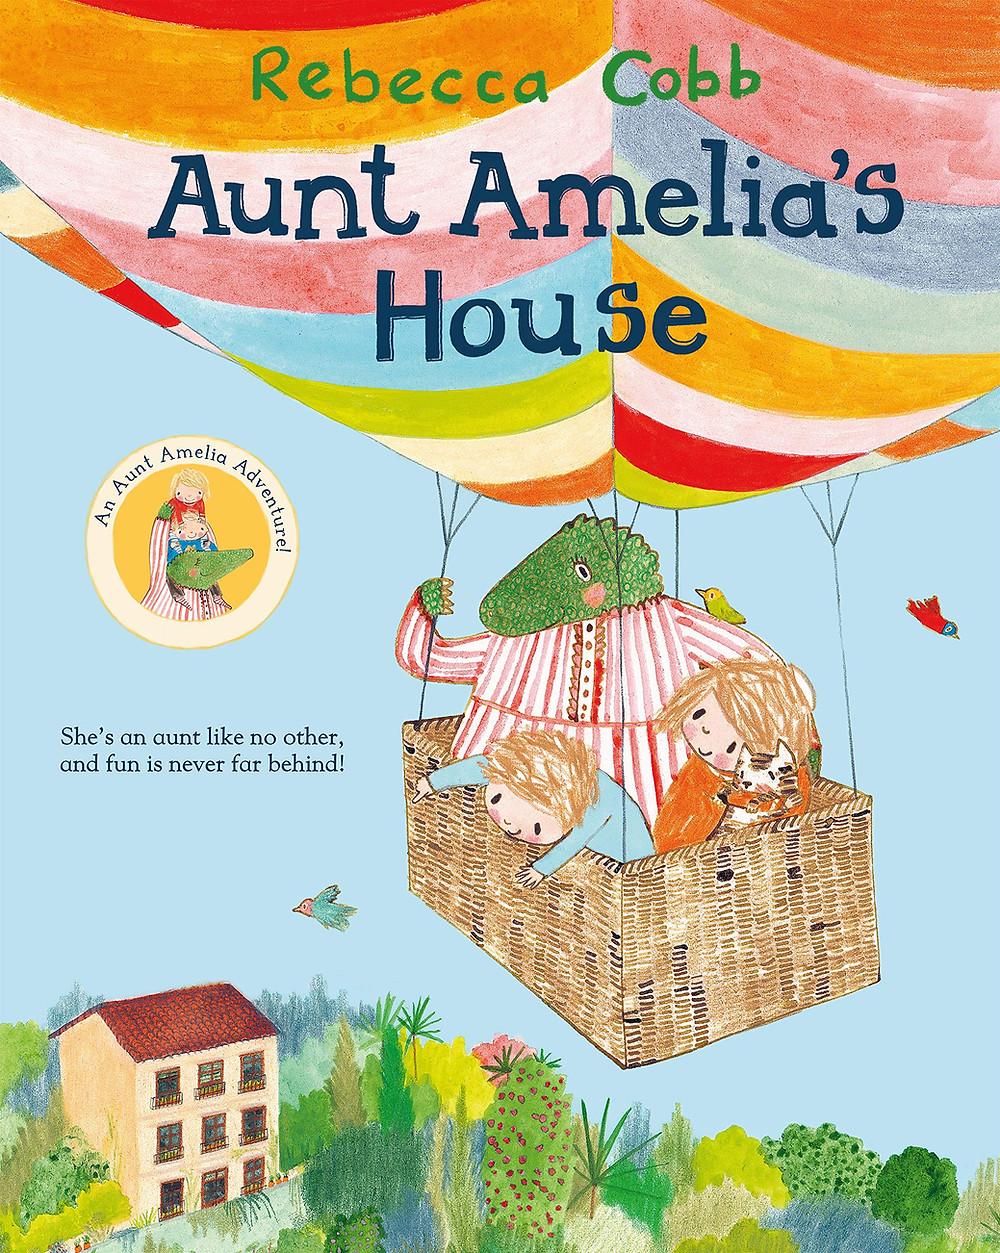 Aunt Amelia's House by Rebecca Cobb, Macmillan